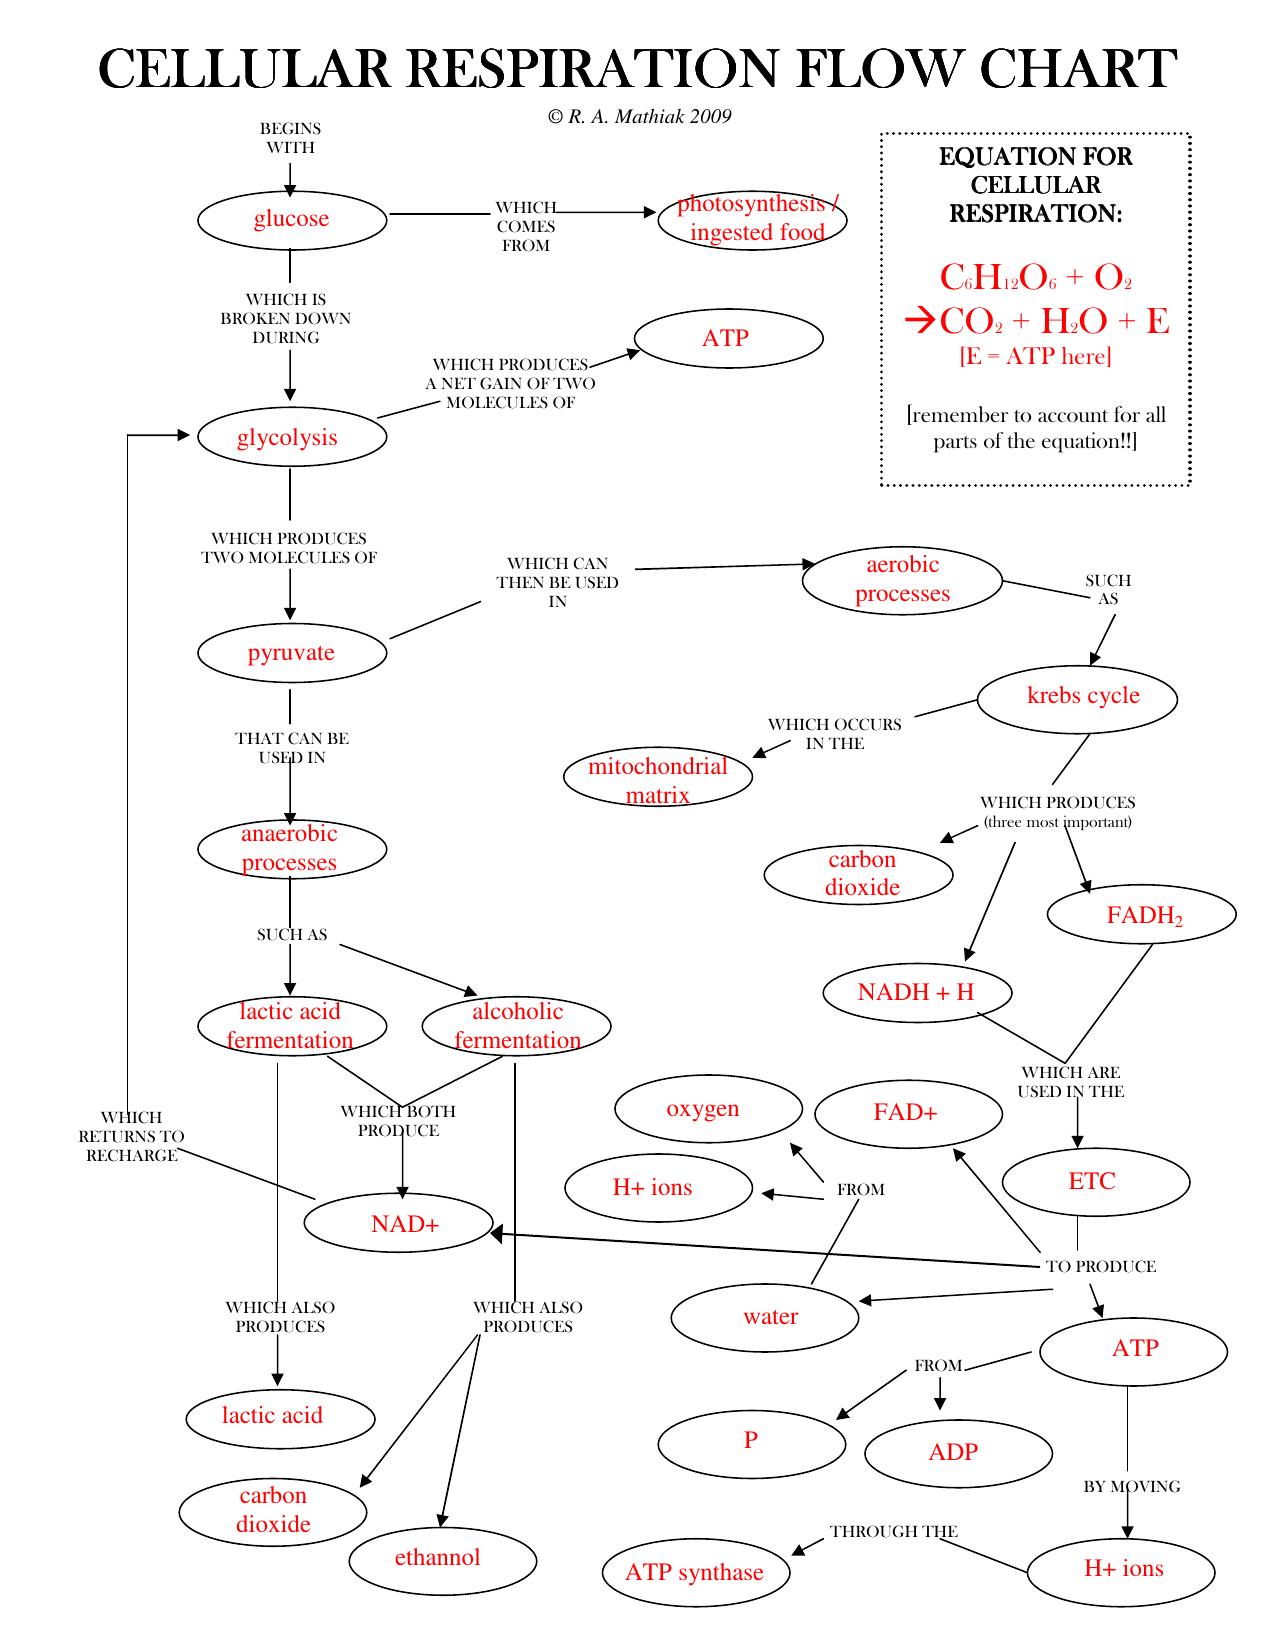 Cellular respiration flow chart cellular respiration flow nvjuhfo Choice Image